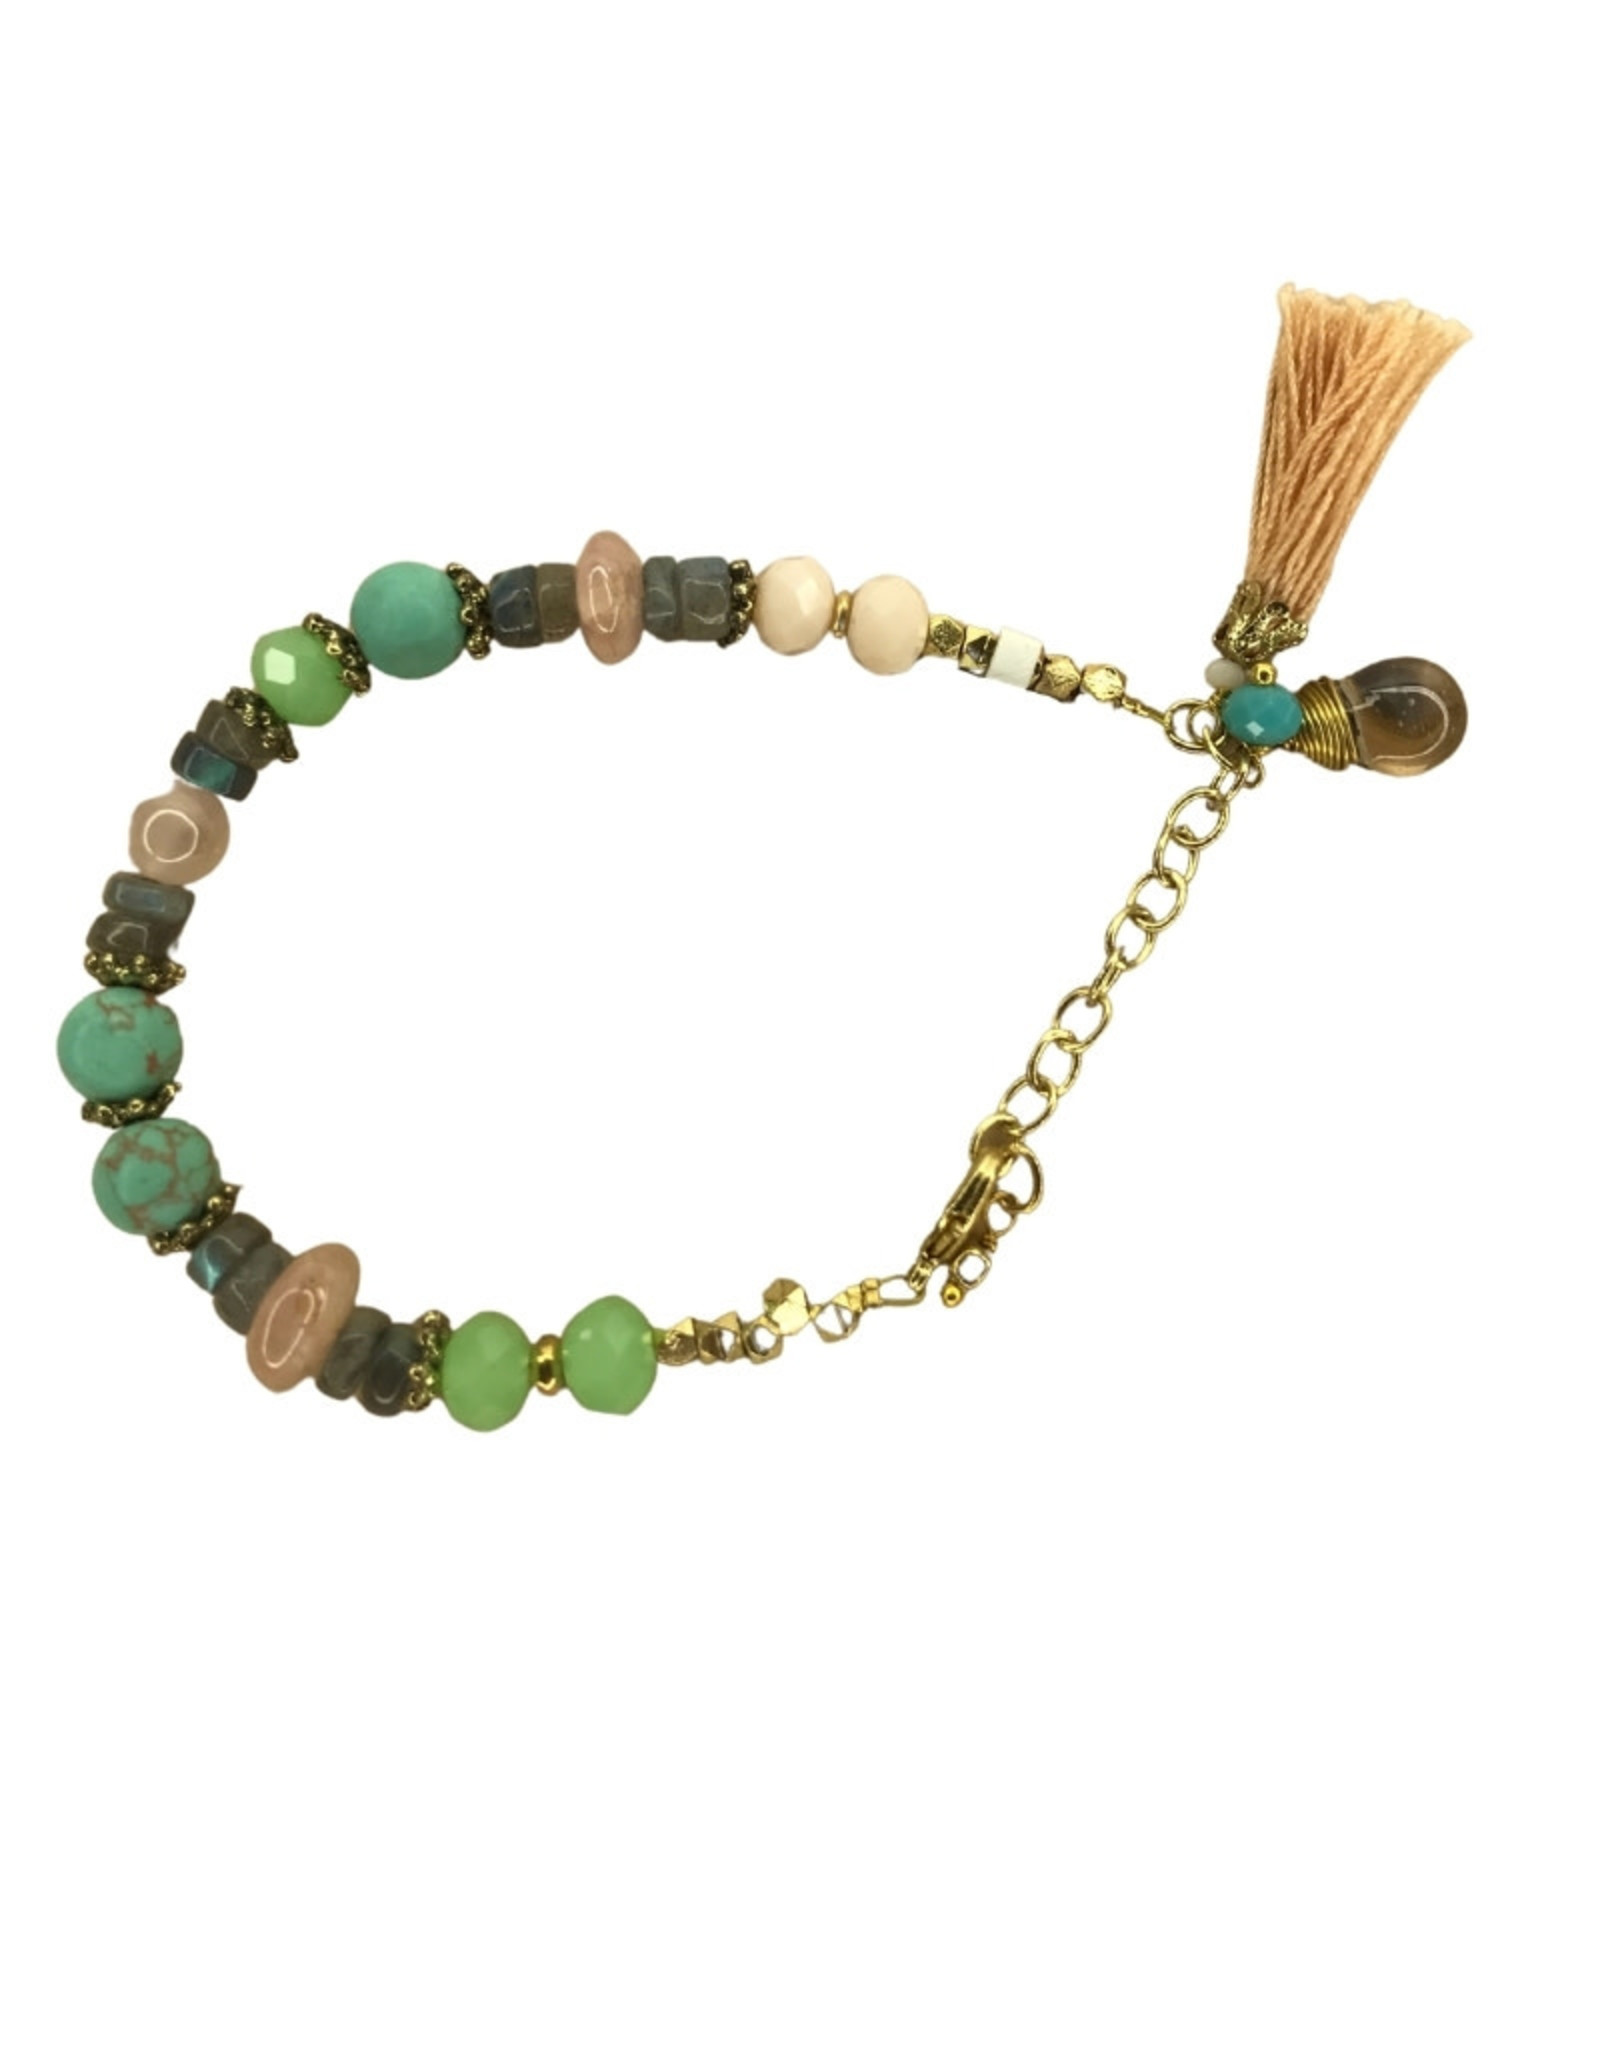 Bracelet Gold Color Stone/Metal/Glass/Tassel